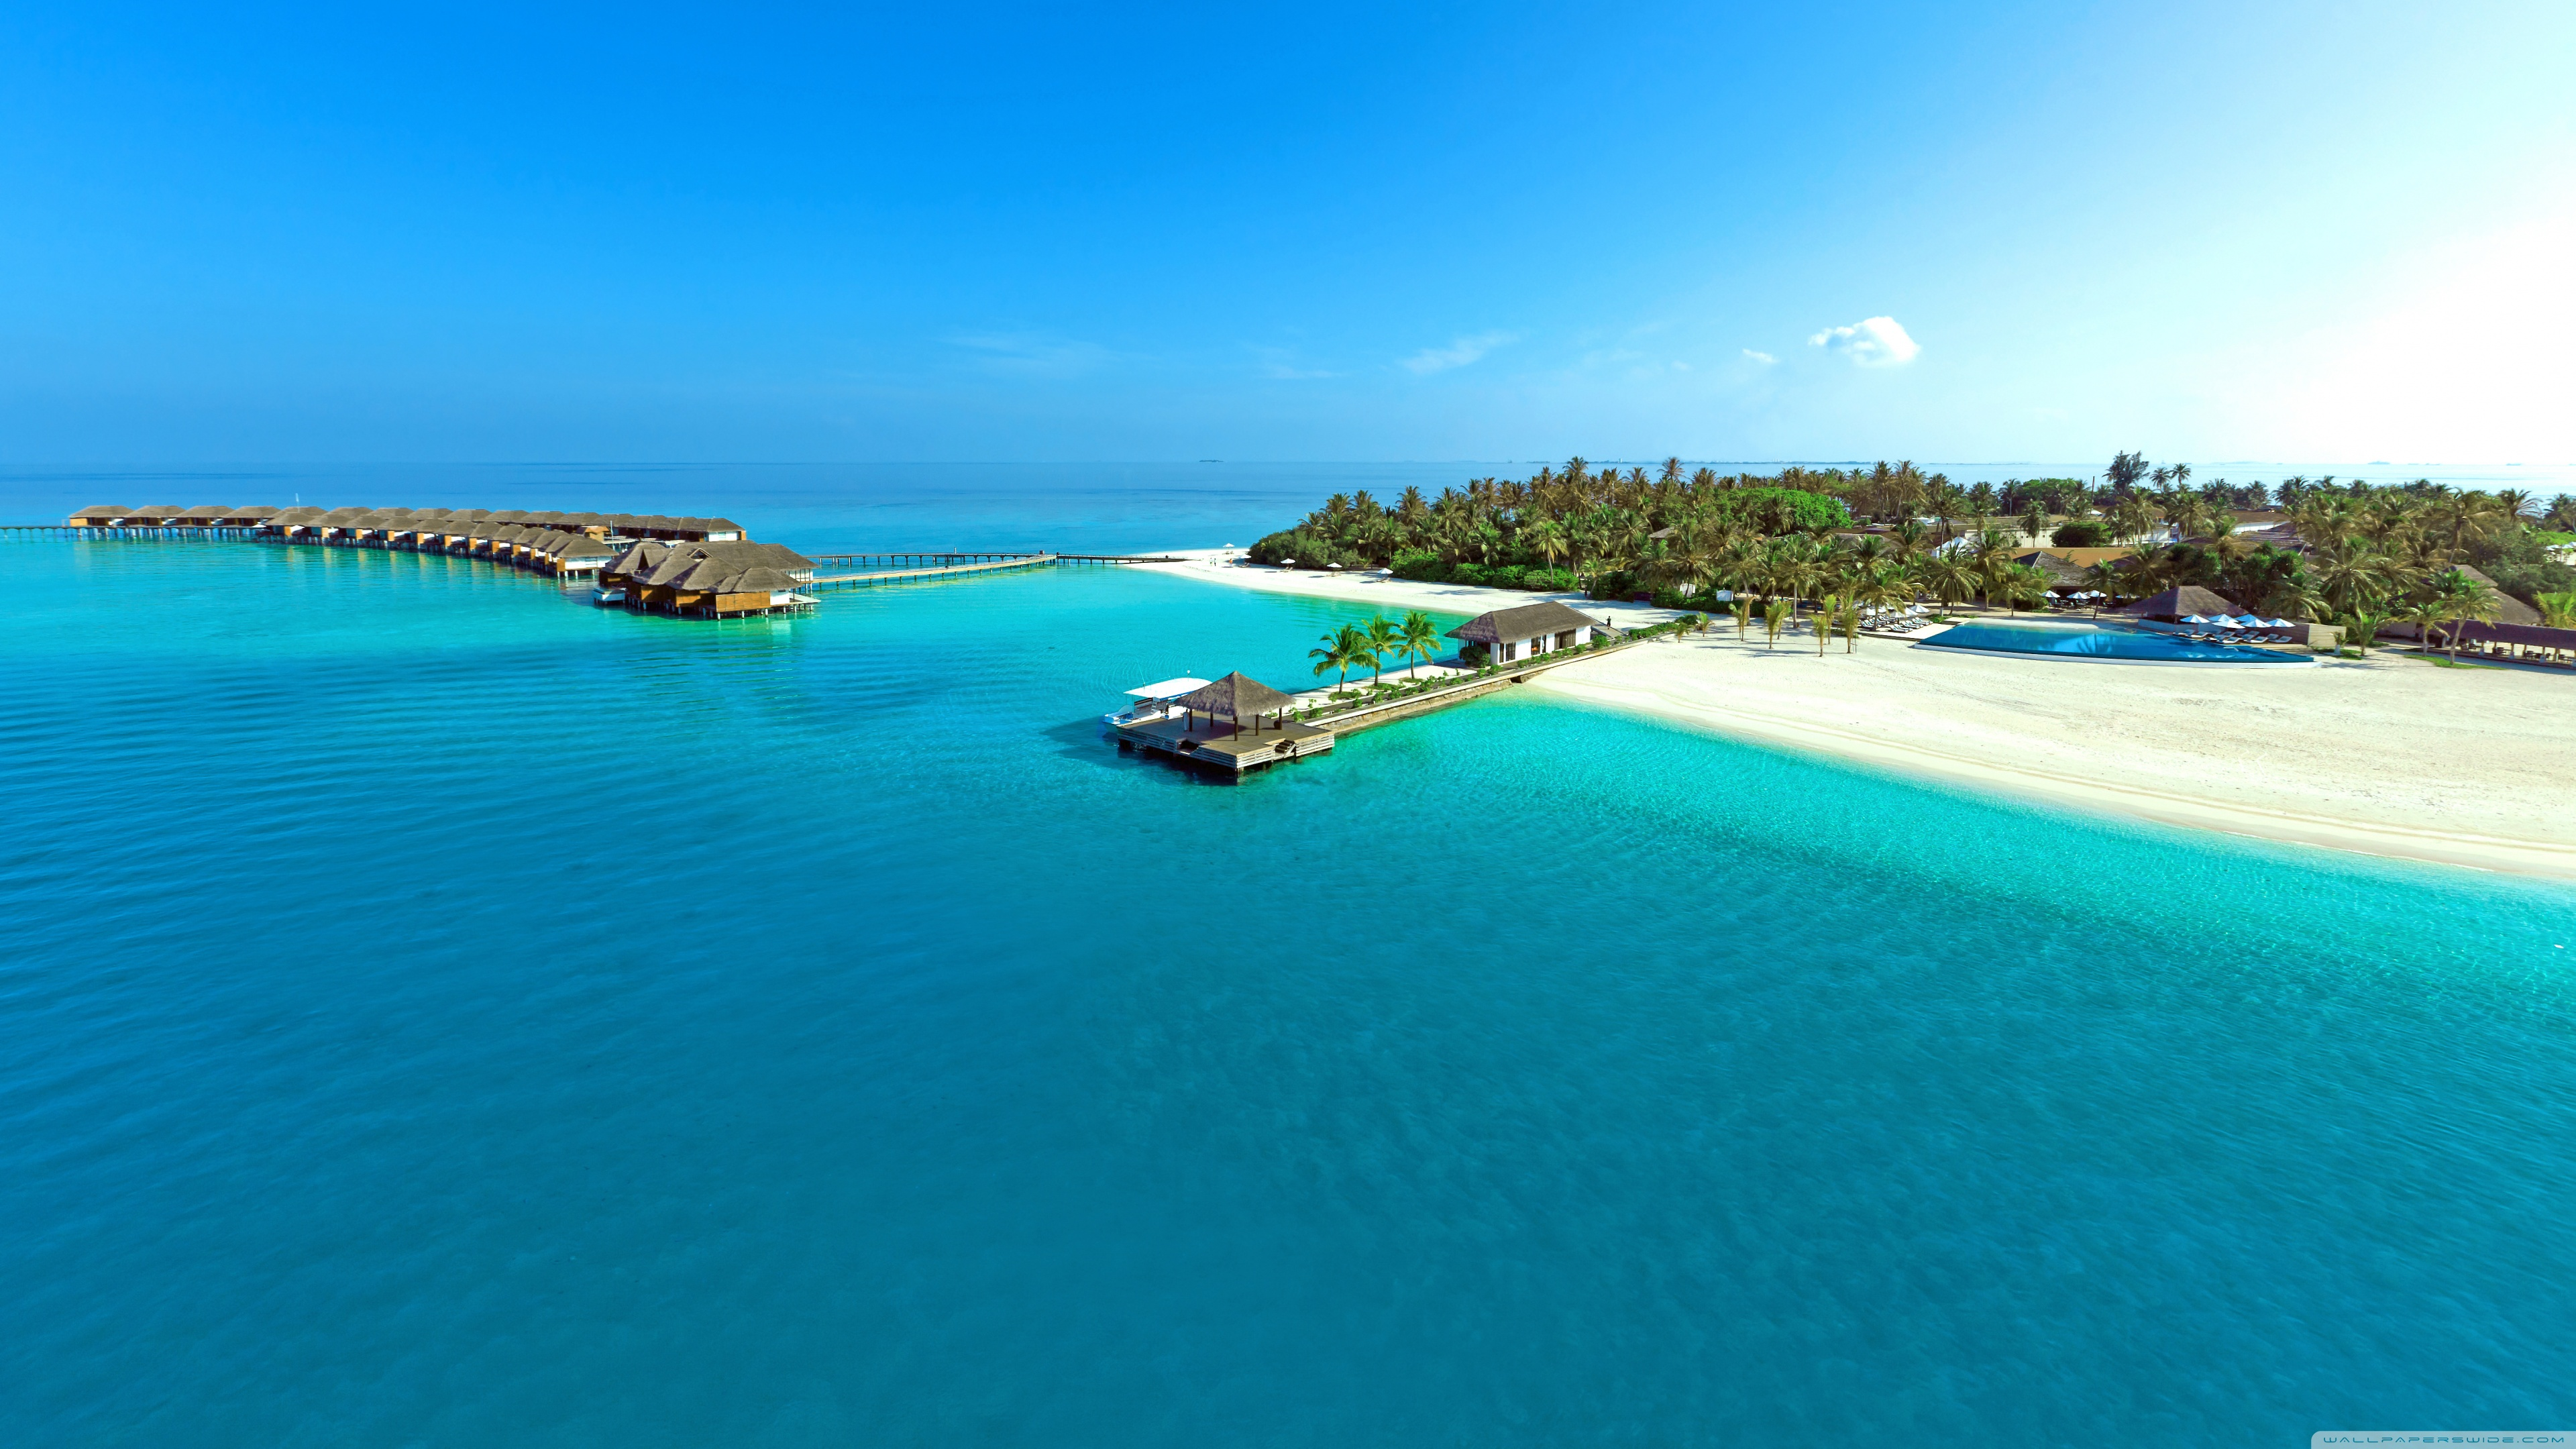 Tropical Island Paradise HD Wallpaper WallpaperListsCOM 3840x2160